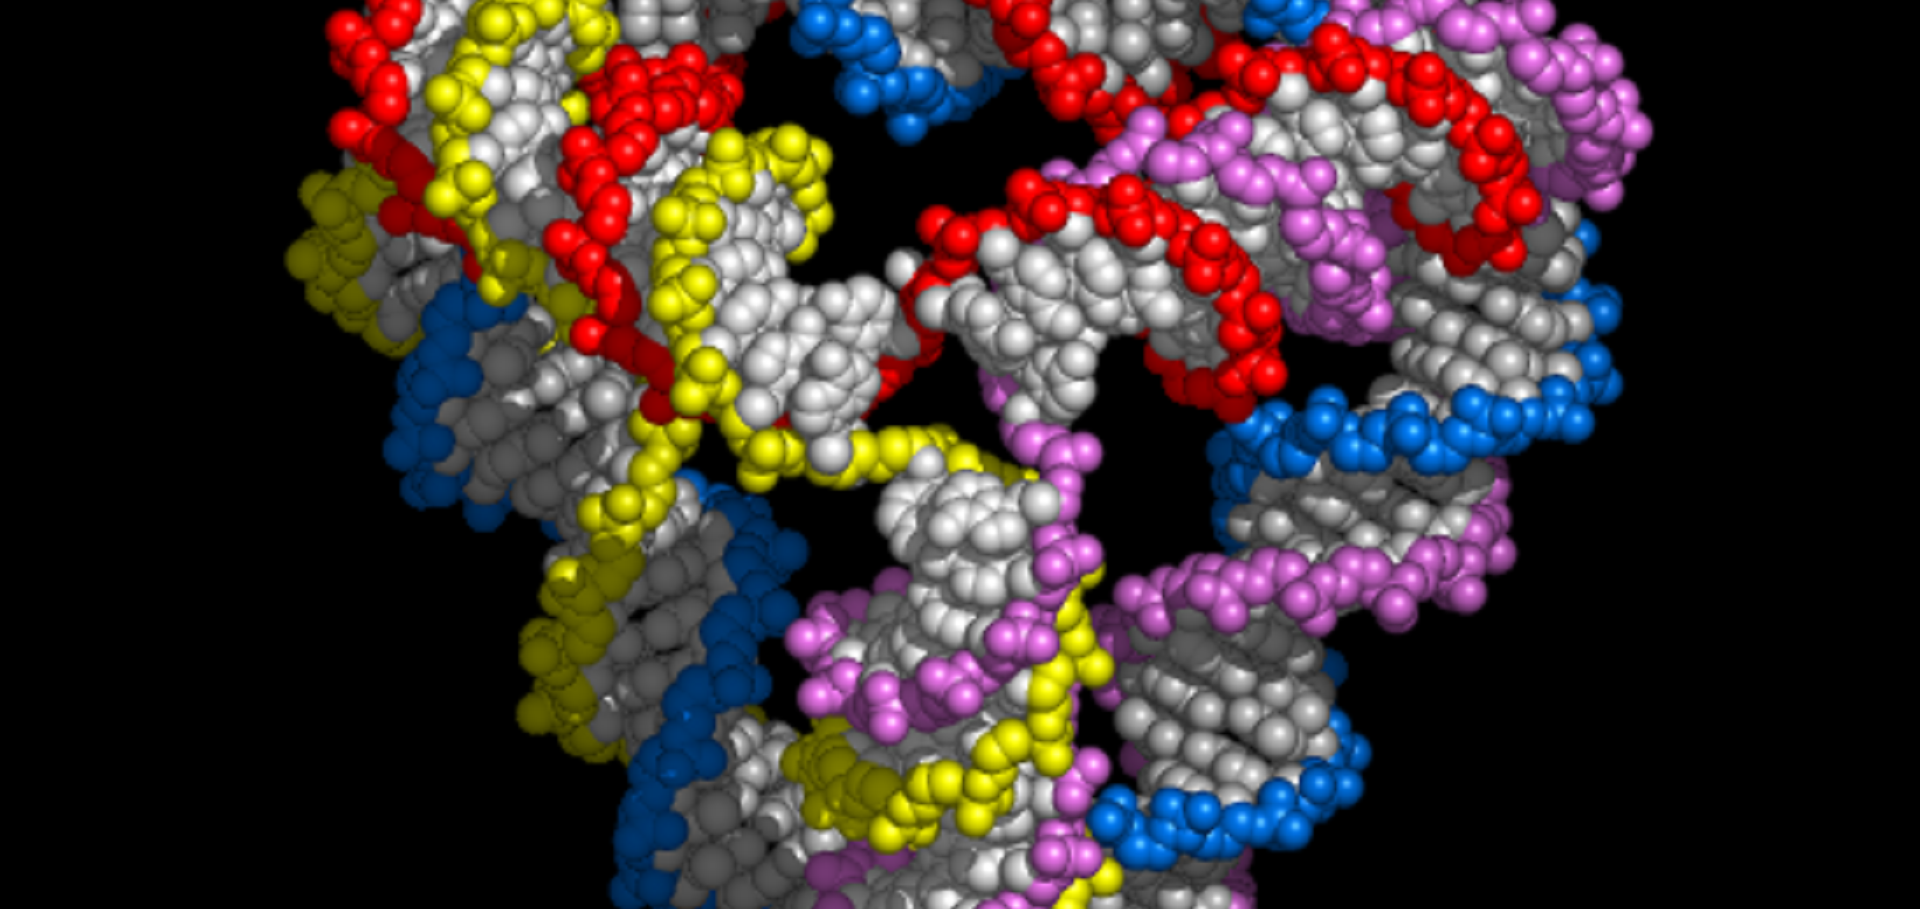 DNA tetrahedron